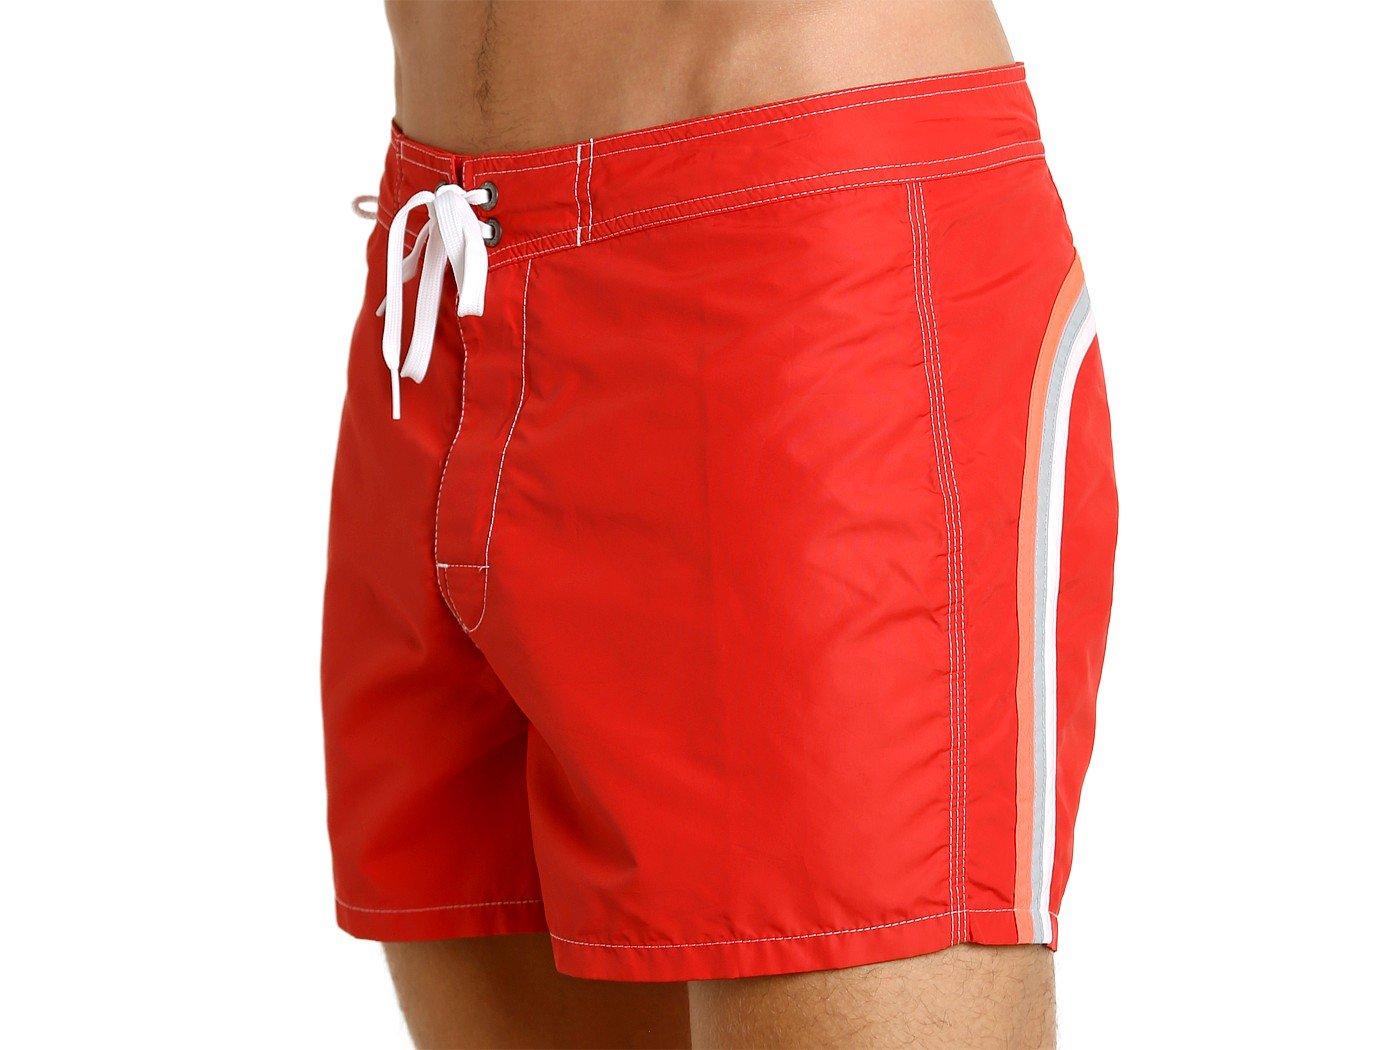 SUNDEK Men's Boardshort With Rainbow -Low Rise 14'' 34 FIRE RED #2-449